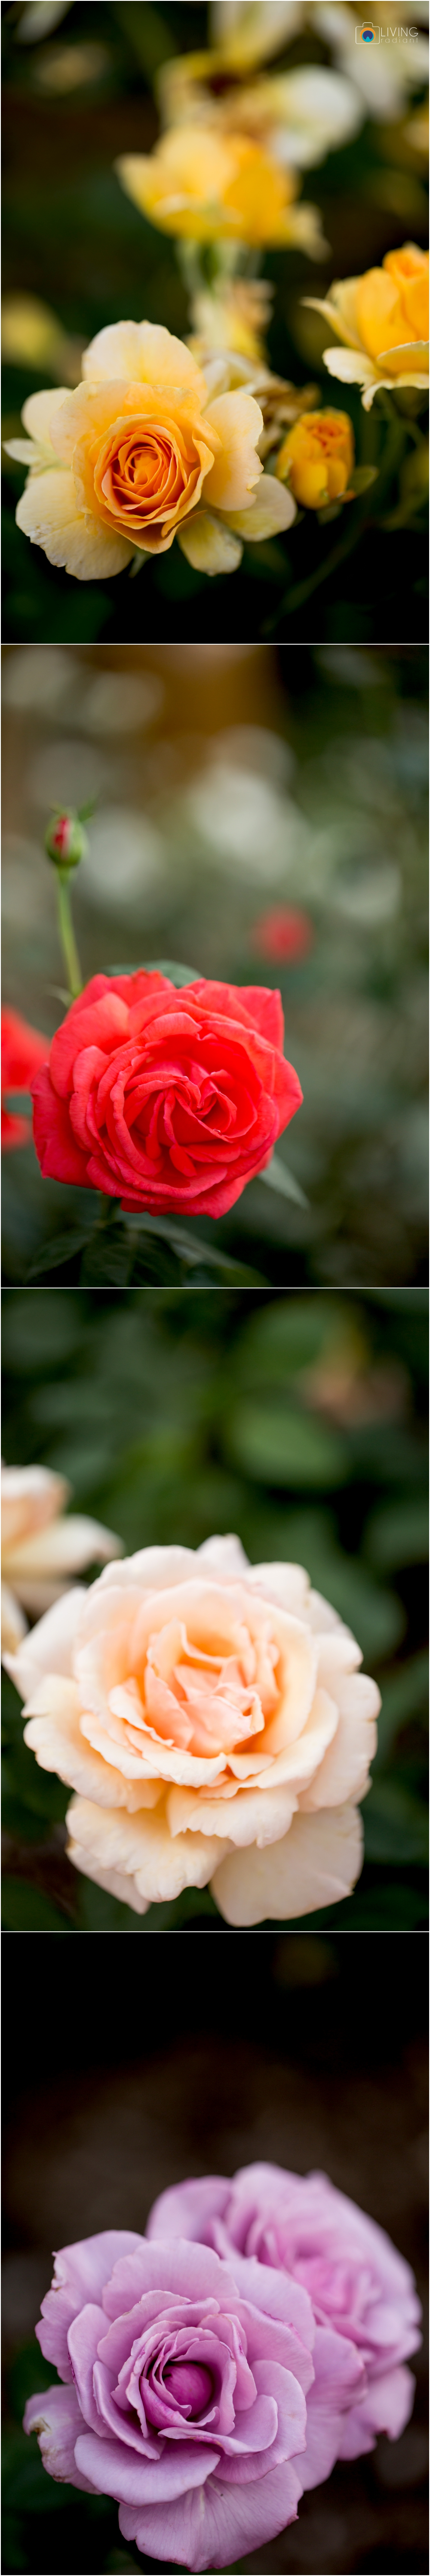 melissa-chris-brookside-gardens-engagement-session-outdoor-gardens-living-radiant-photography-maggie-patrick-nolan_0033.jpg